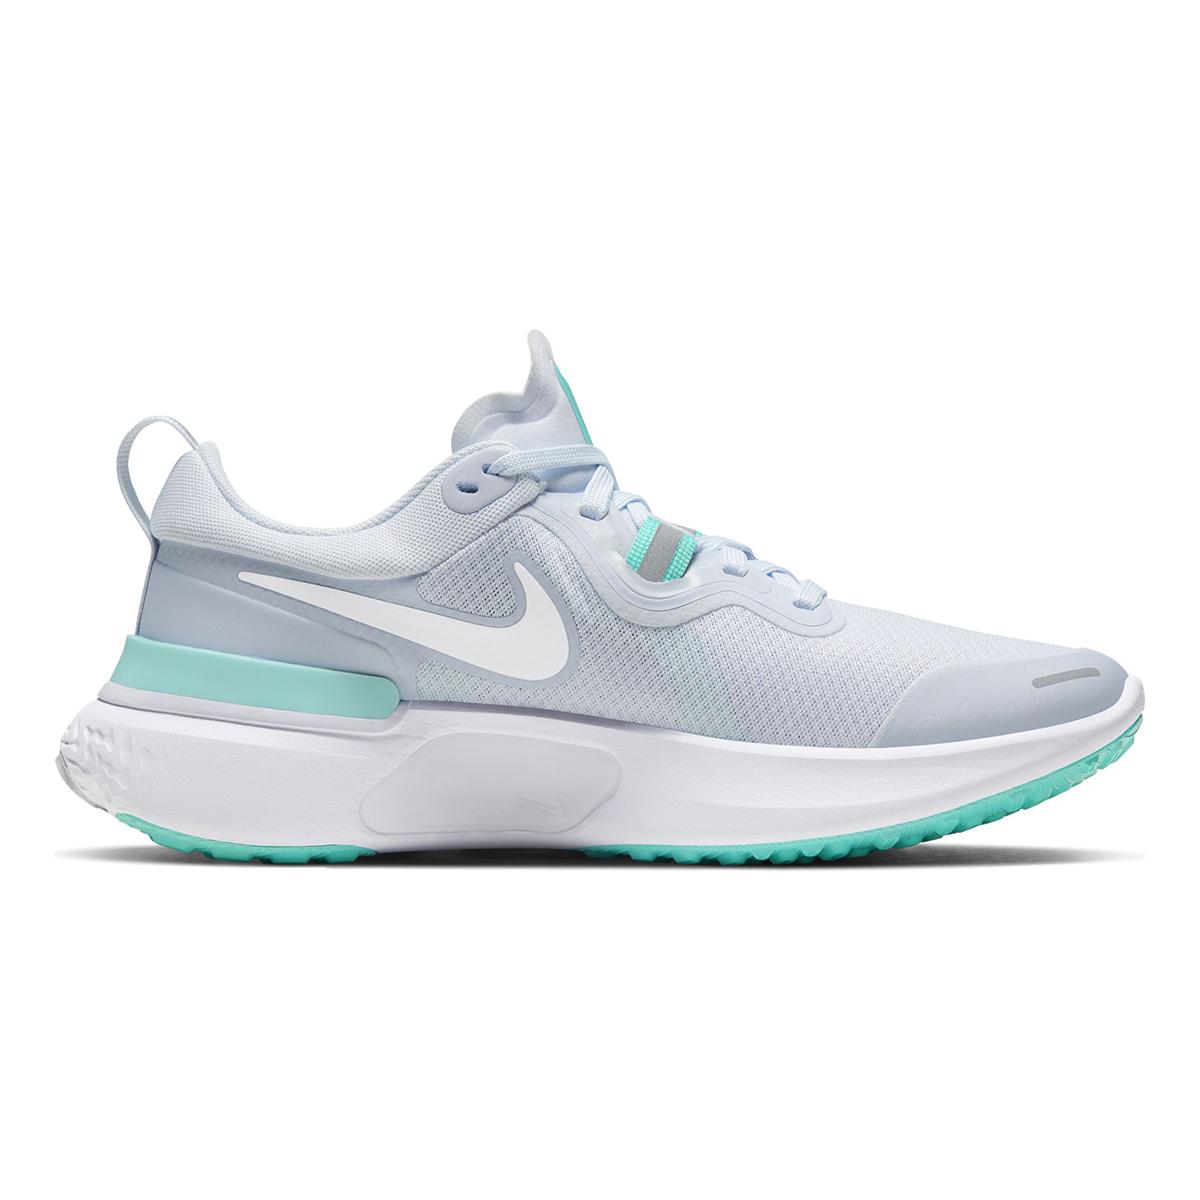 Women's Nike React Miler Running Shoe - Color: Football Grey/Aurora Green/White (Regular Width) - Size: 5.5, Football Grey/Aurora Green/White, large, image 1